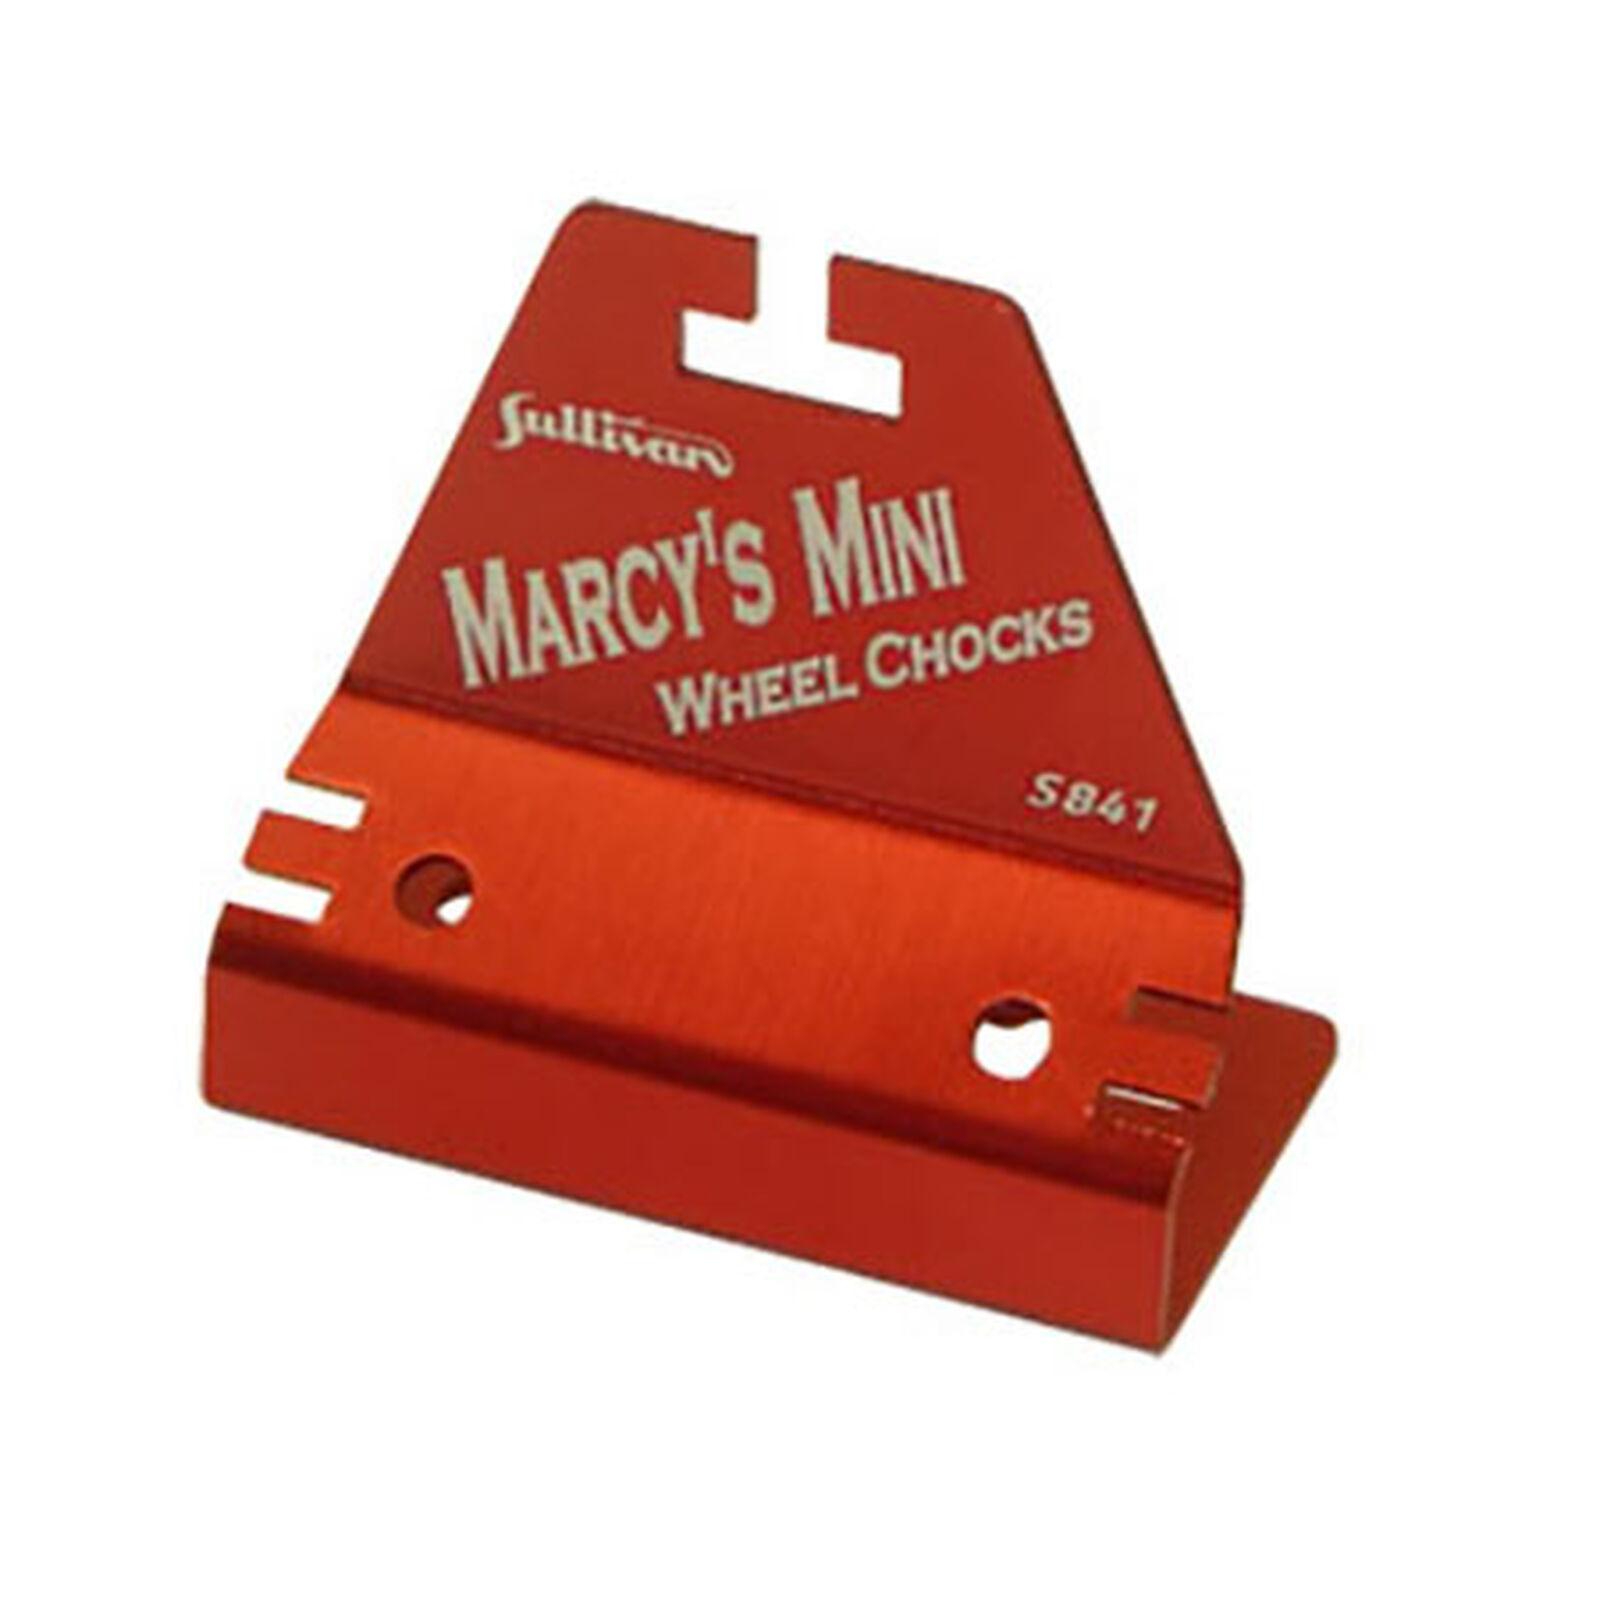 Marcy's Mini Wheel Chocks